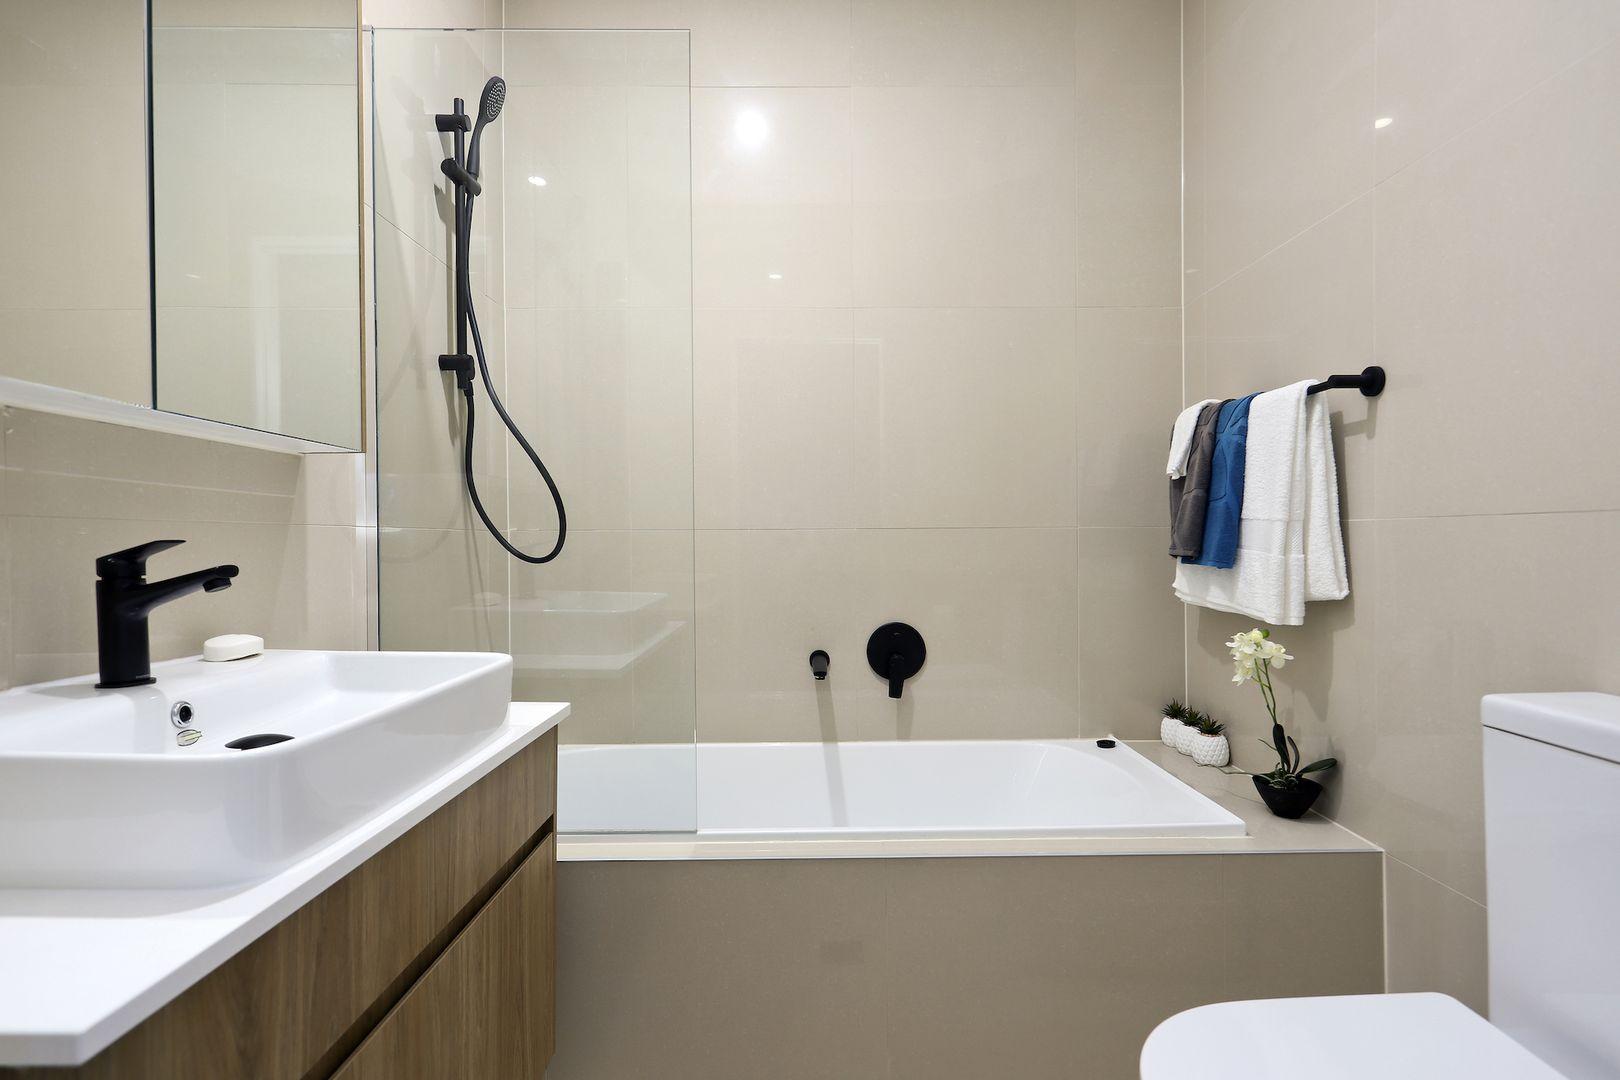 117-119 Jamison Road, Penrith NSW 2750, Image 2